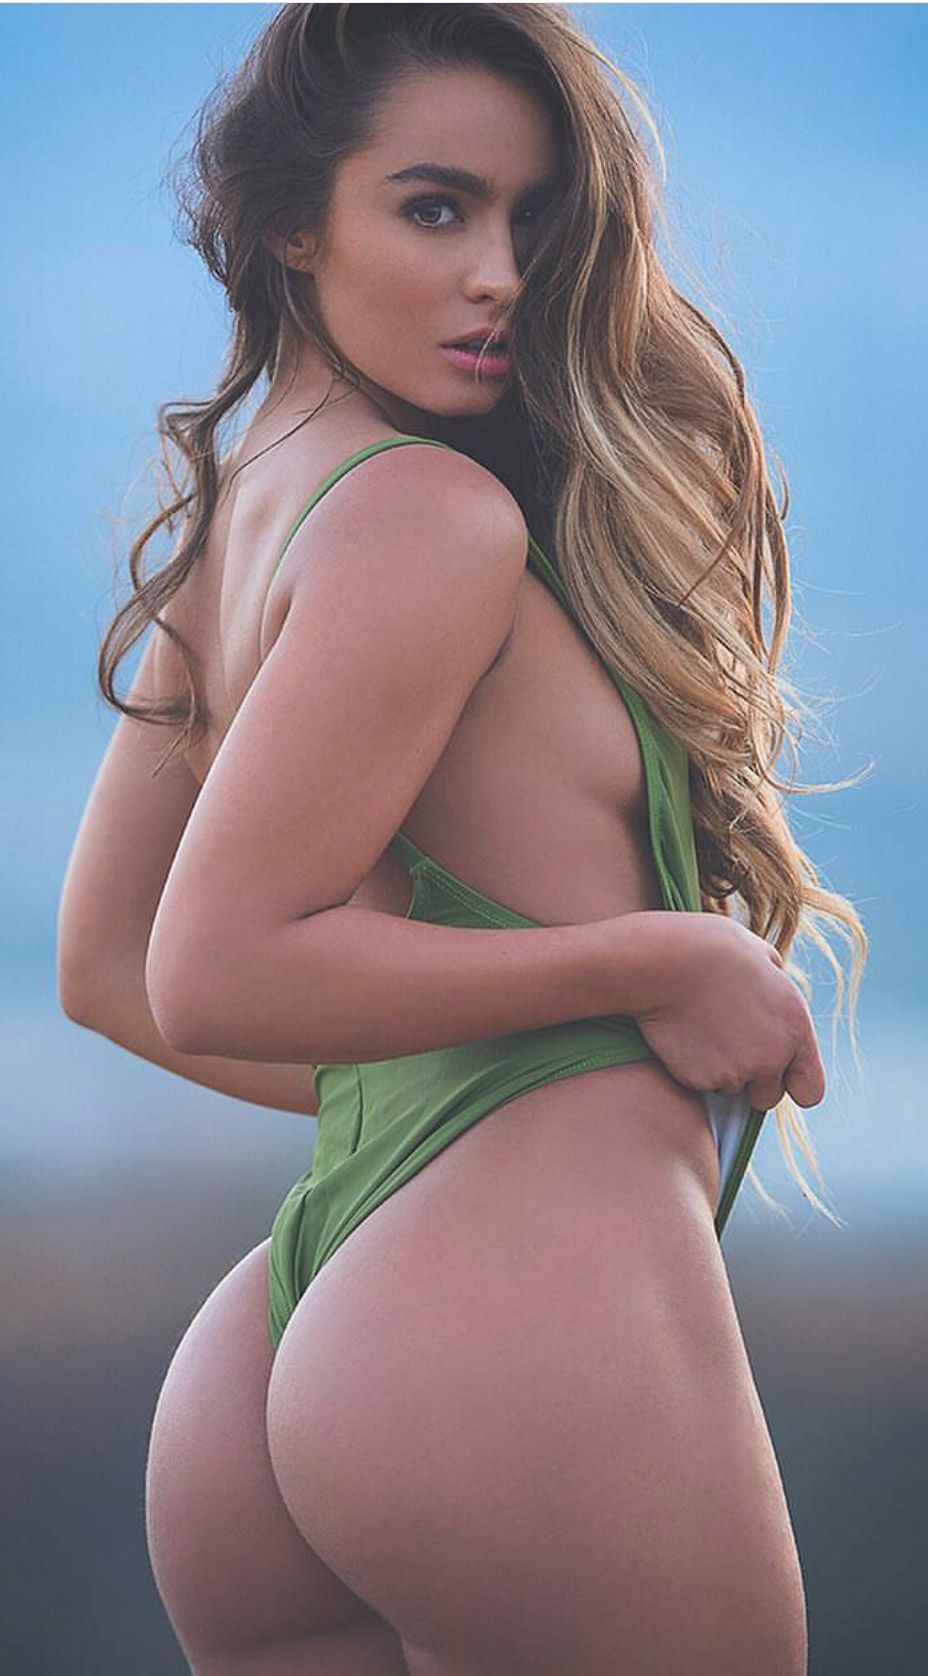 Boobs Evelyn Sommer nude photos 2019